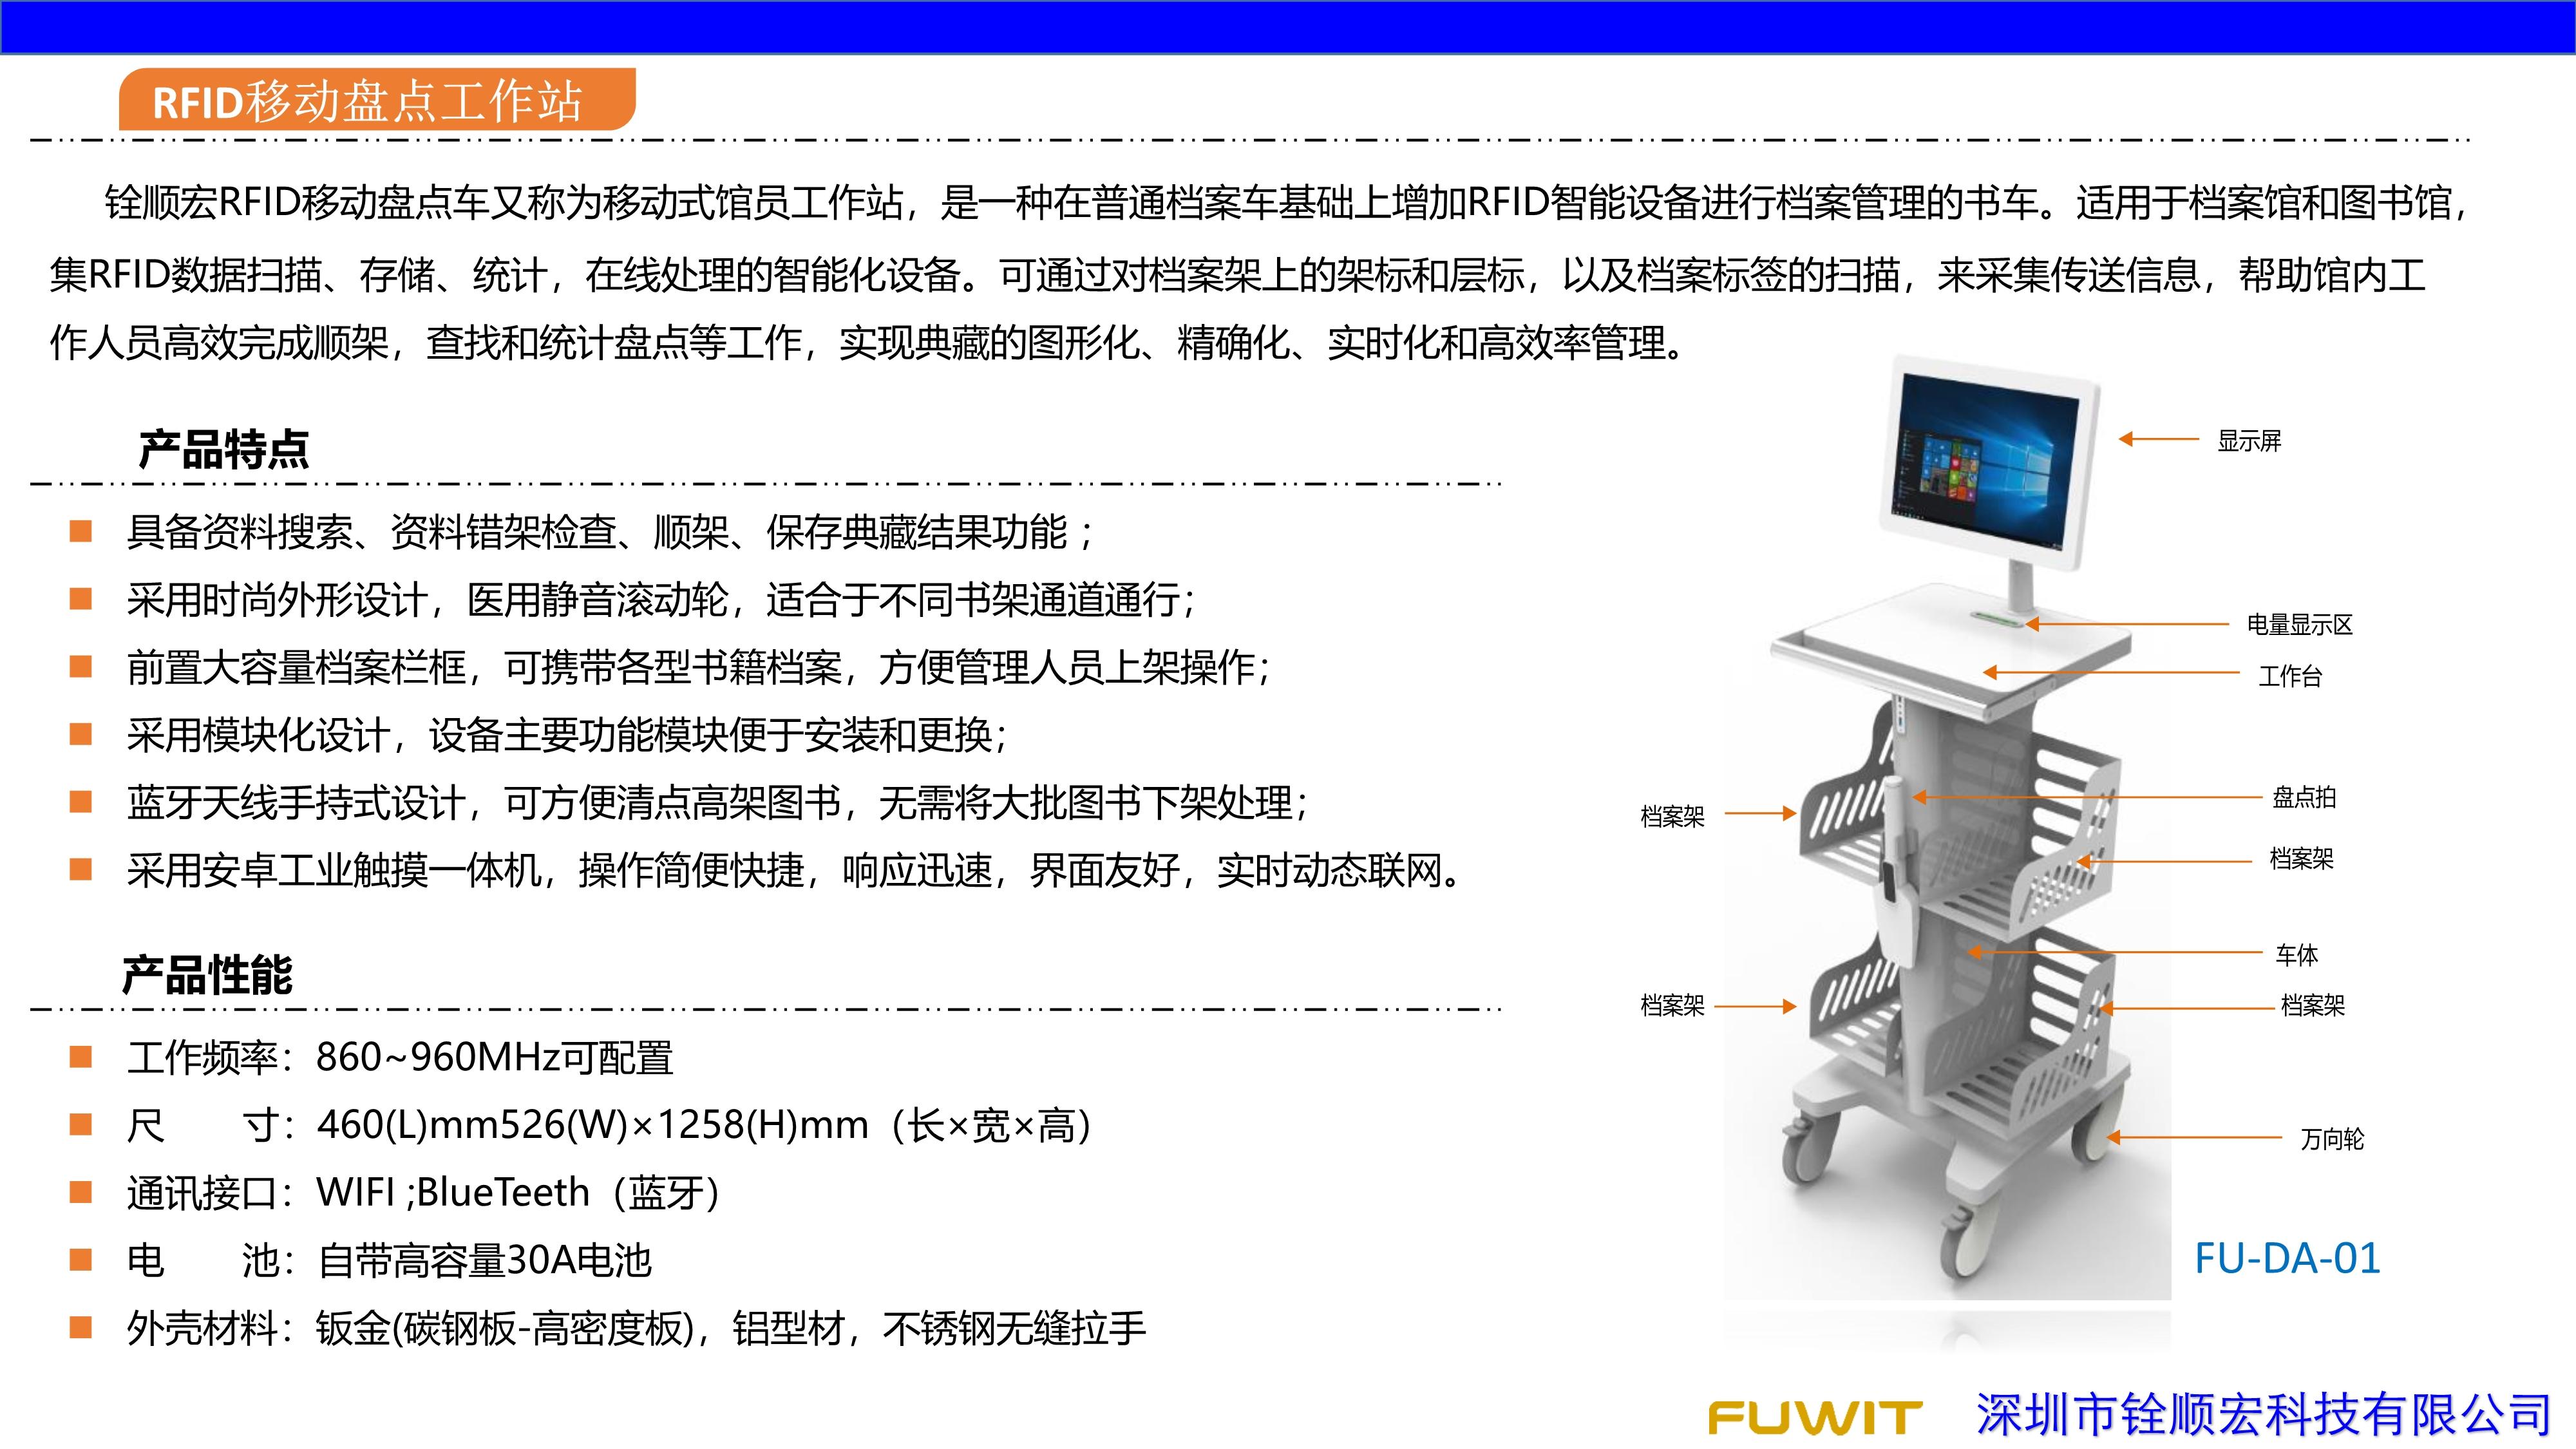 rfid数字化智能档案管理应用,rfid工作站